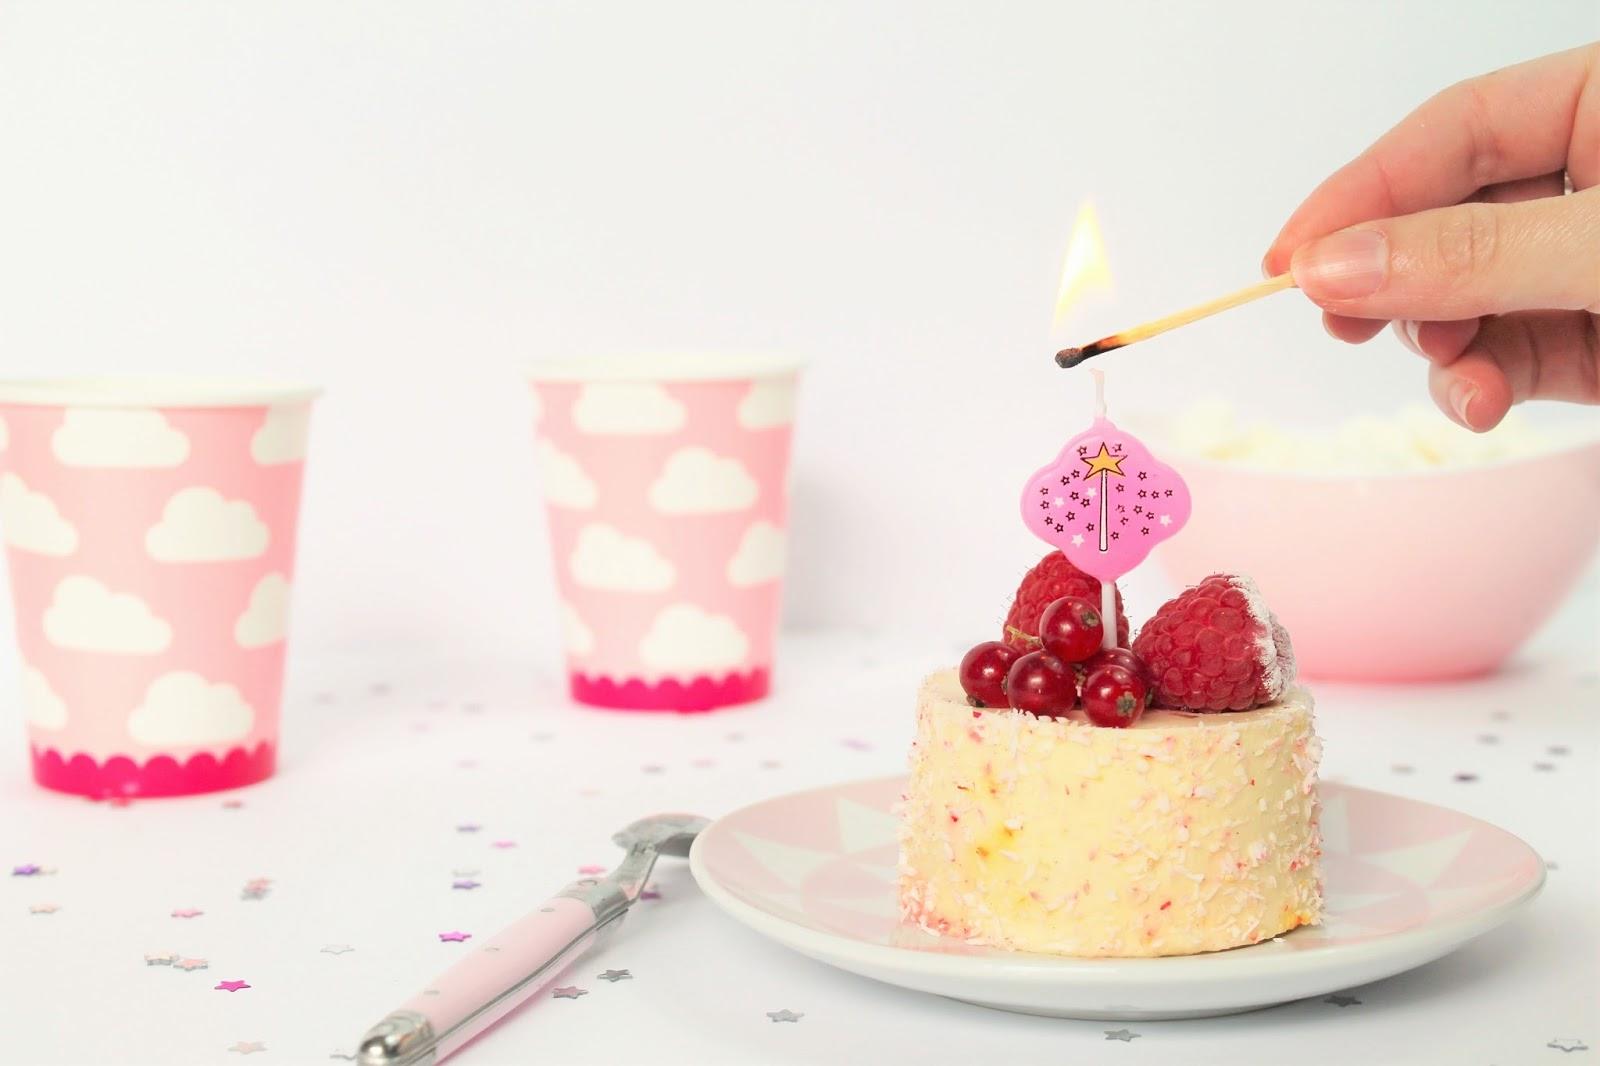 les gommettes de melo blog blogueuse 2017 blogspot blogger french youtube youtubeuse vidéo anniversaire blog 1 an bougie blogosphere gâteau pink rose poudre happy birthday